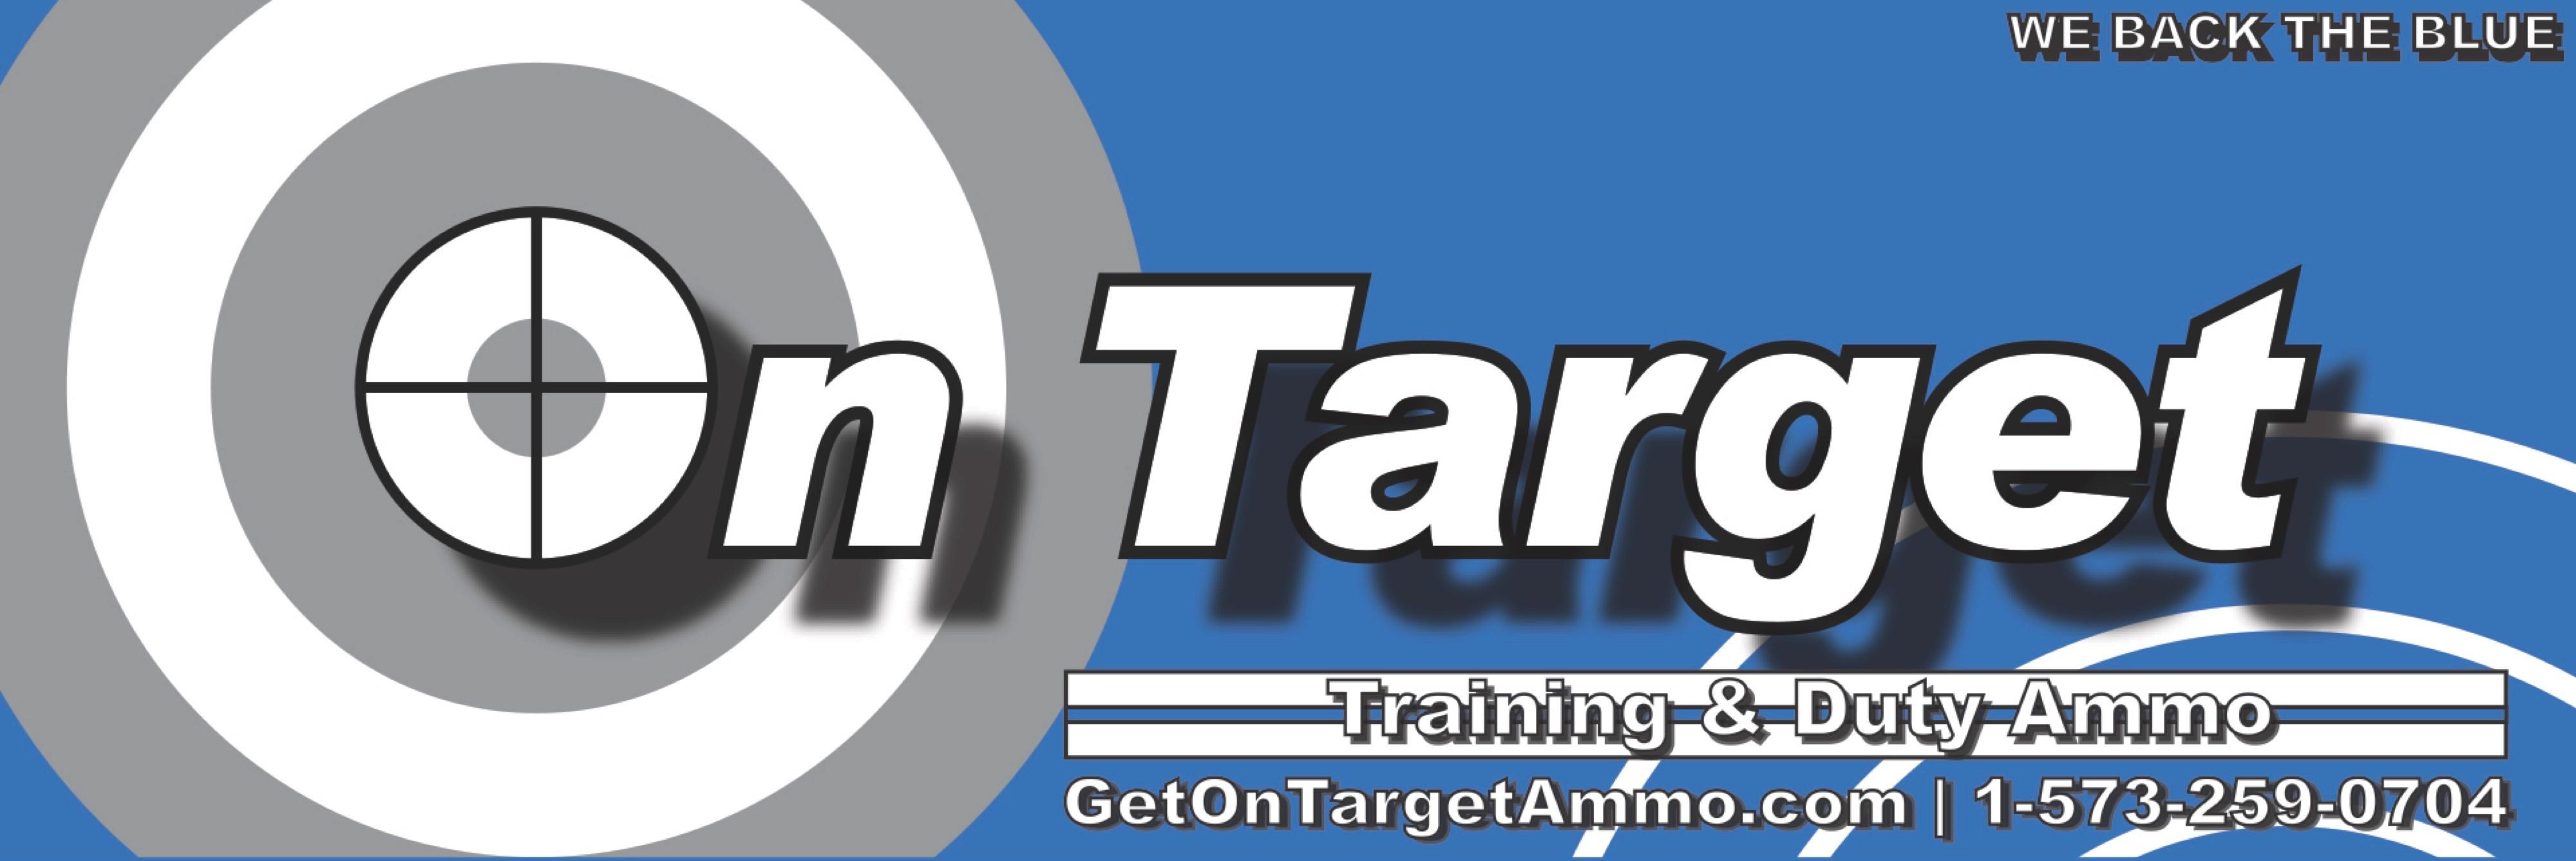 On Target Ammo for Law Enforcement, On Target Ammunition,